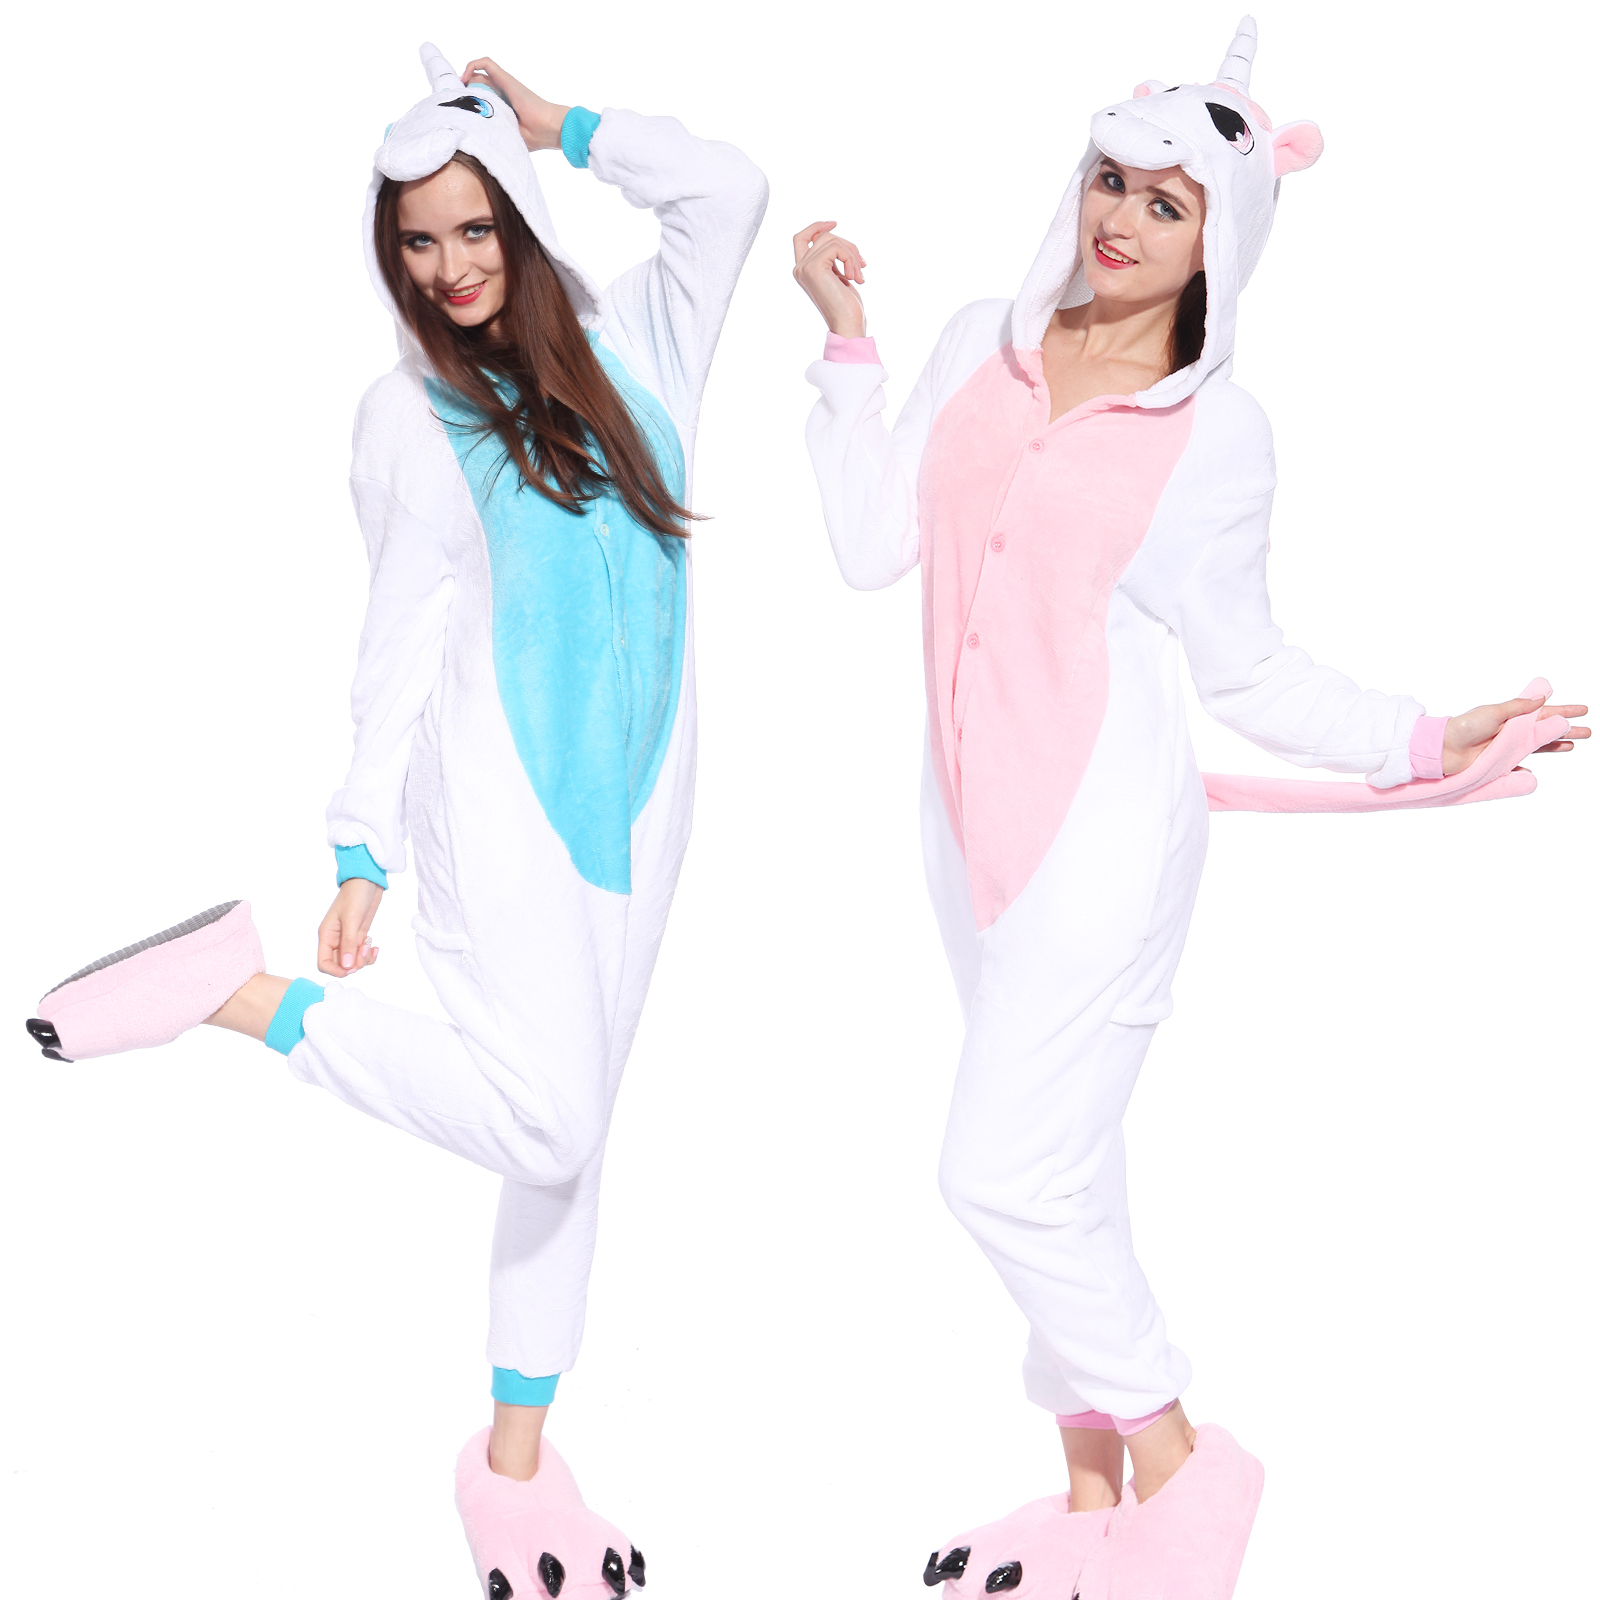 pyjama combinaison costume deguisement flanelle capuche licorne adulte carnaval ebay. Black Bedroom Furniture Sets. Home Design Ideas